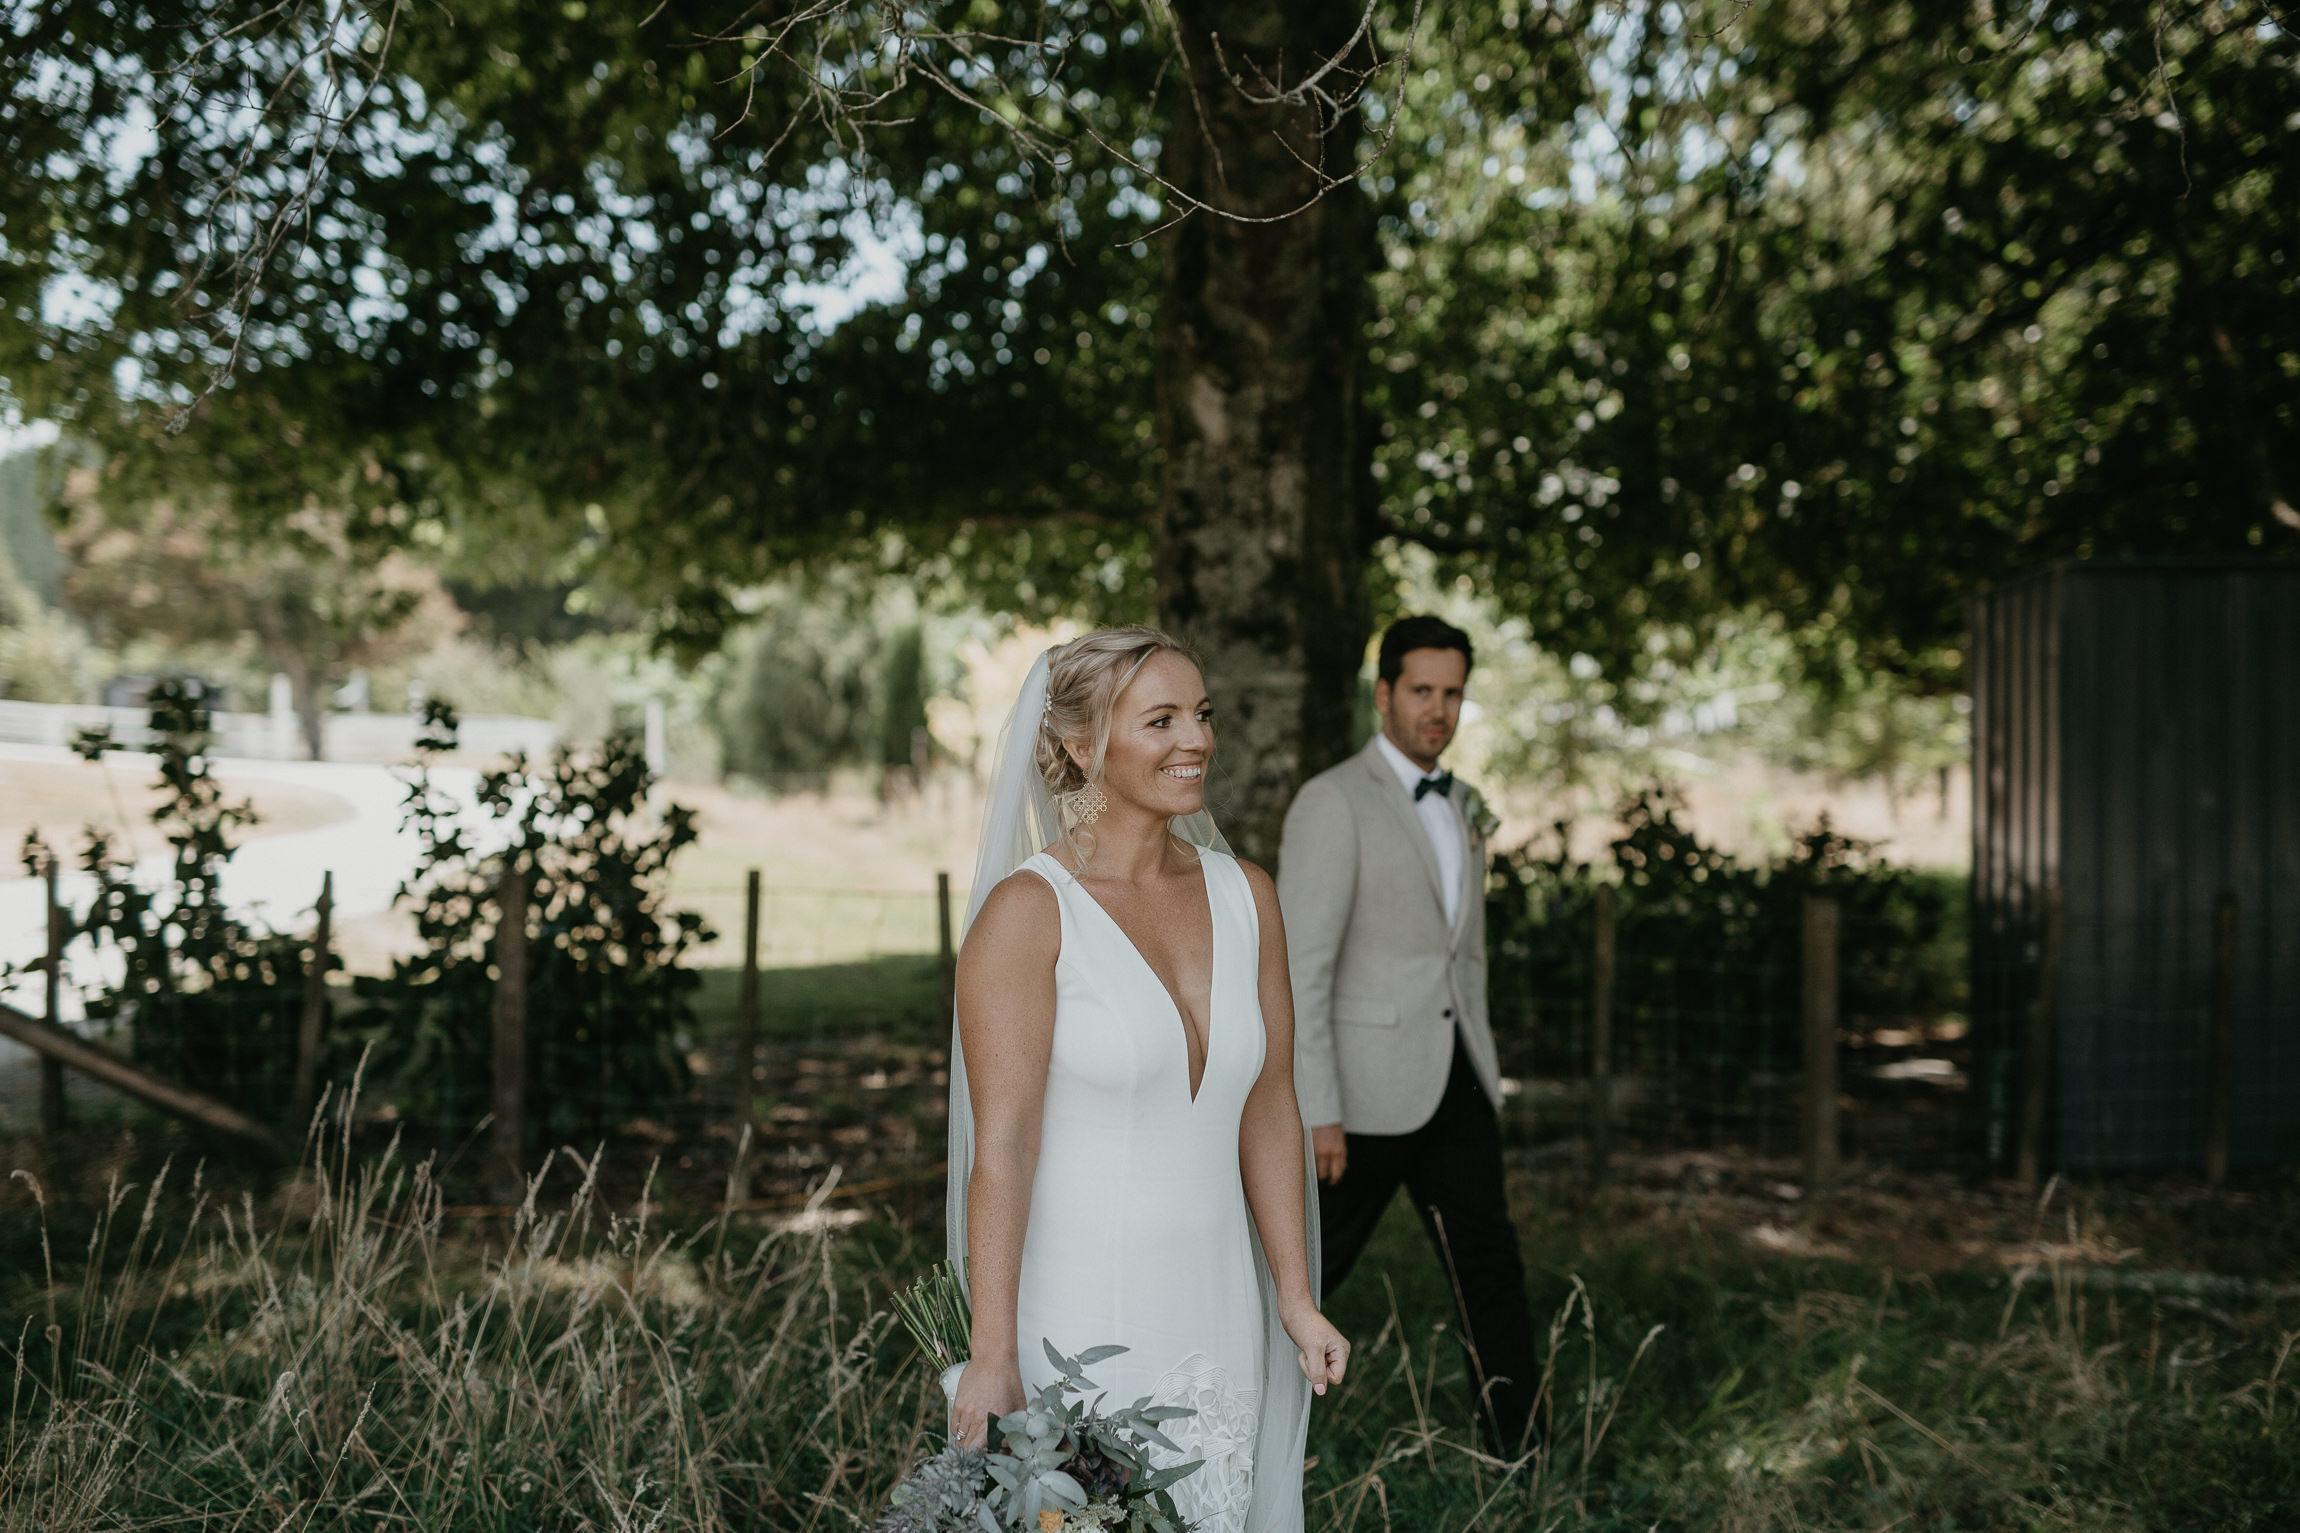 oldforestschool-wedding-blog-53.jpg